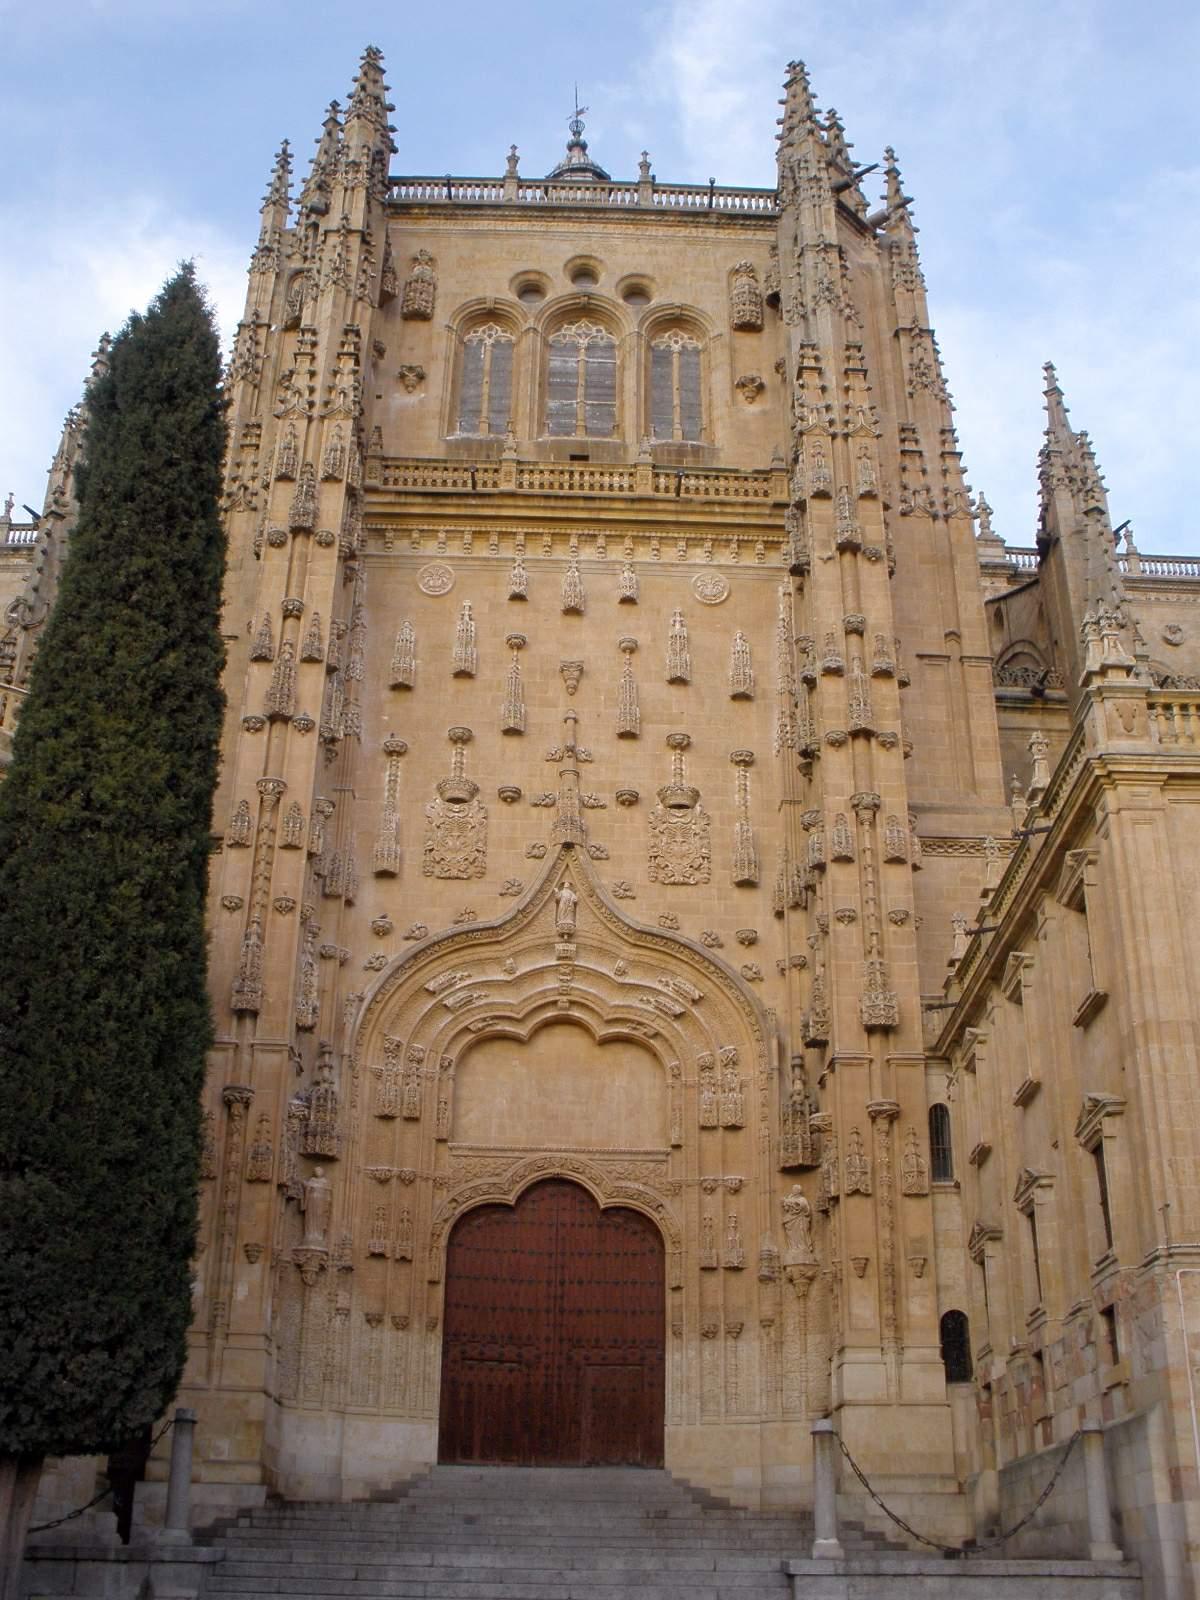 File:Salamanca - Catedral Nueva, exterior 17.jpg - Wikimedia Commons